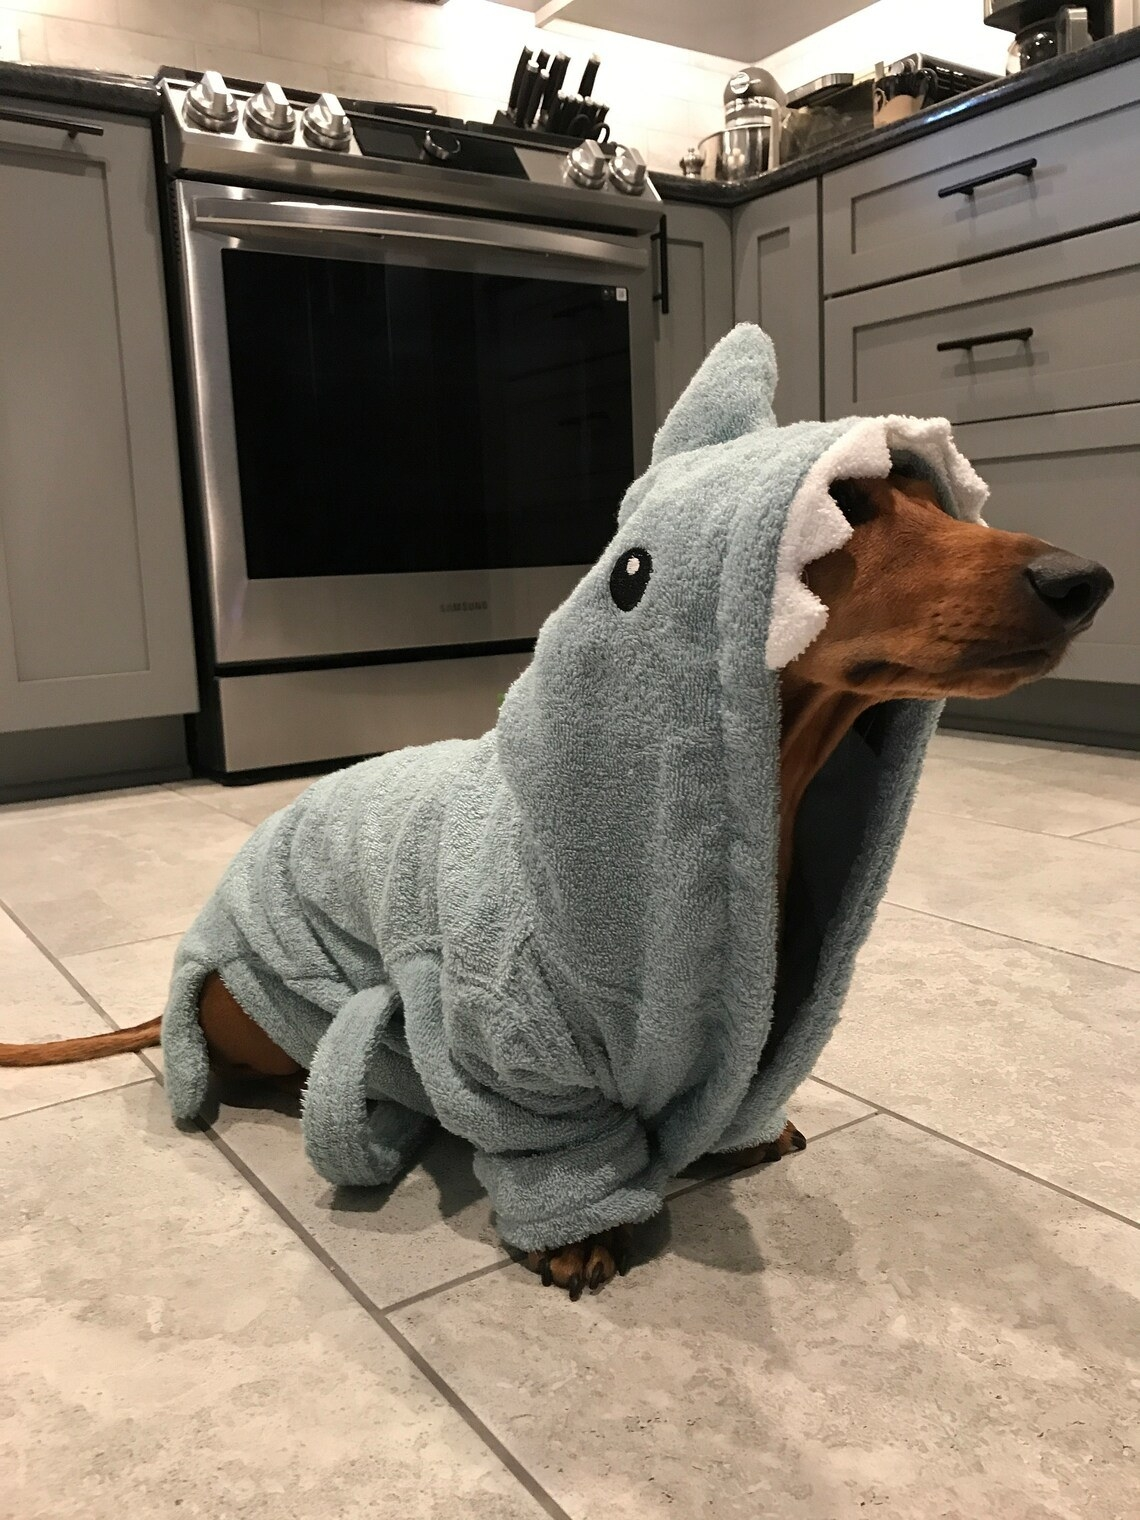 A dog wearing hooded shark towel